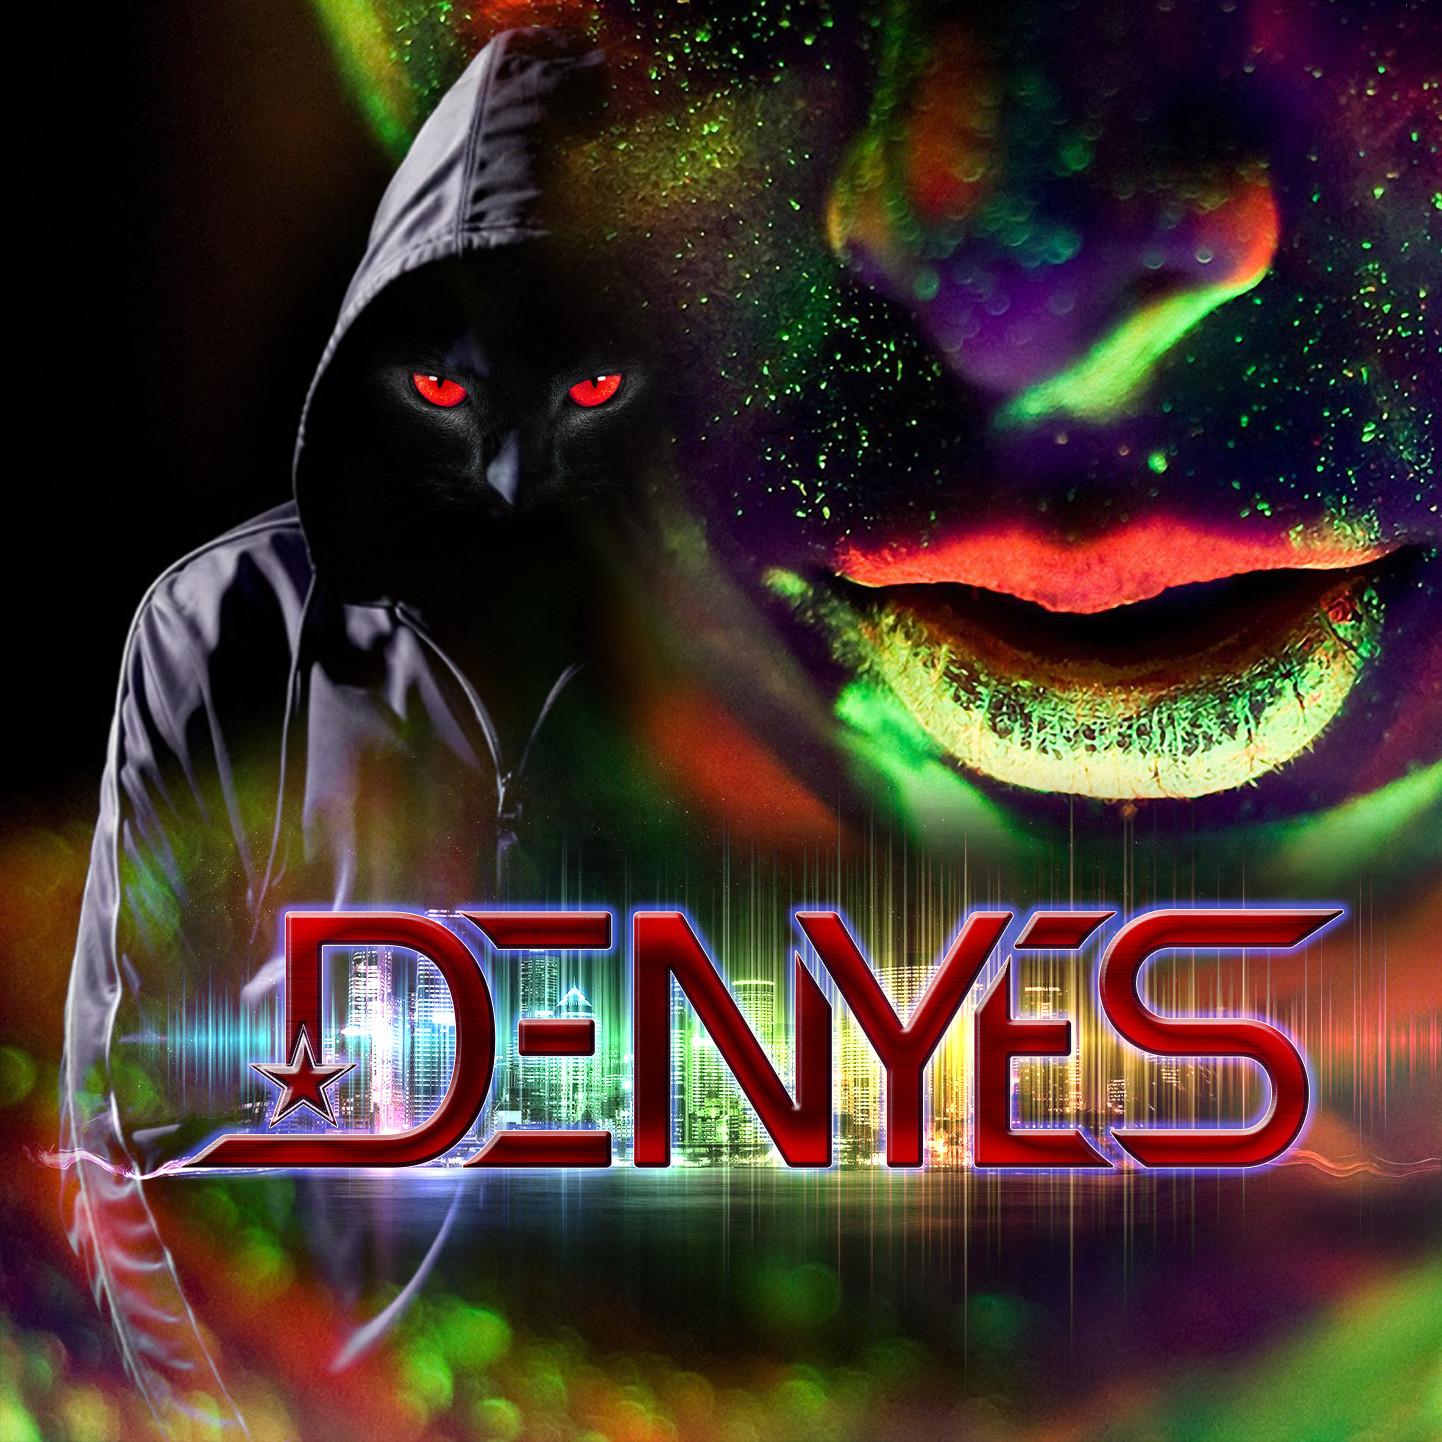 DENYES